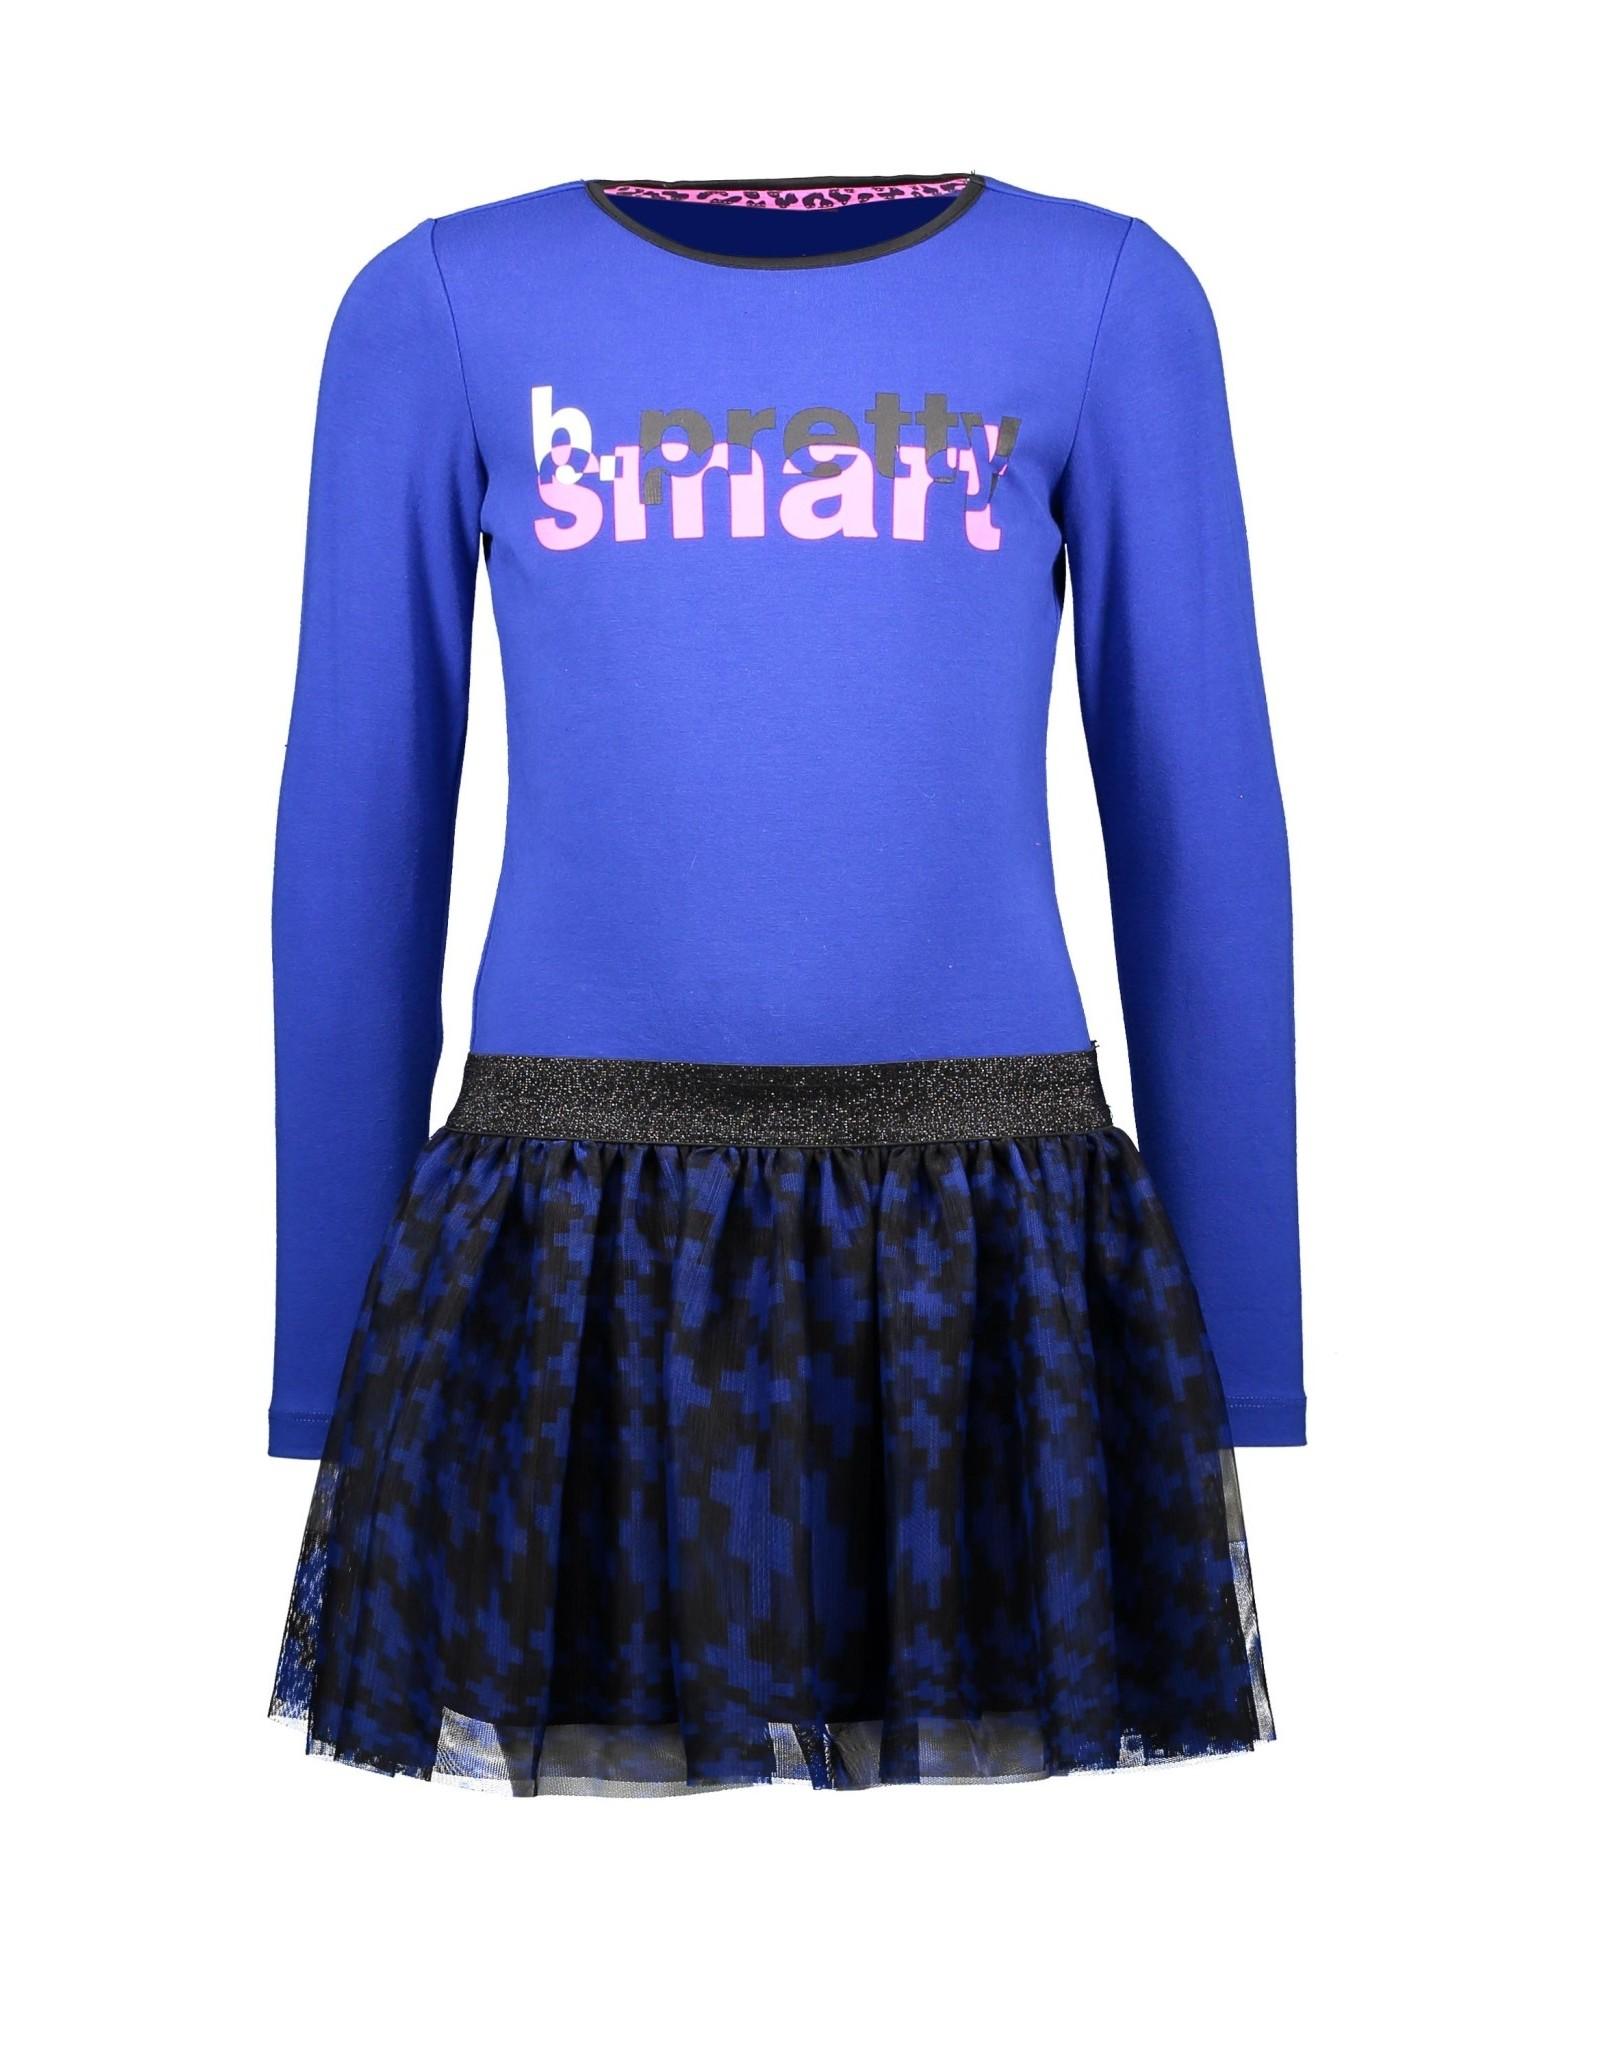 B-nosy Girls dress with pied du poule aop skirt and chest artwork 183 Cobalt blue